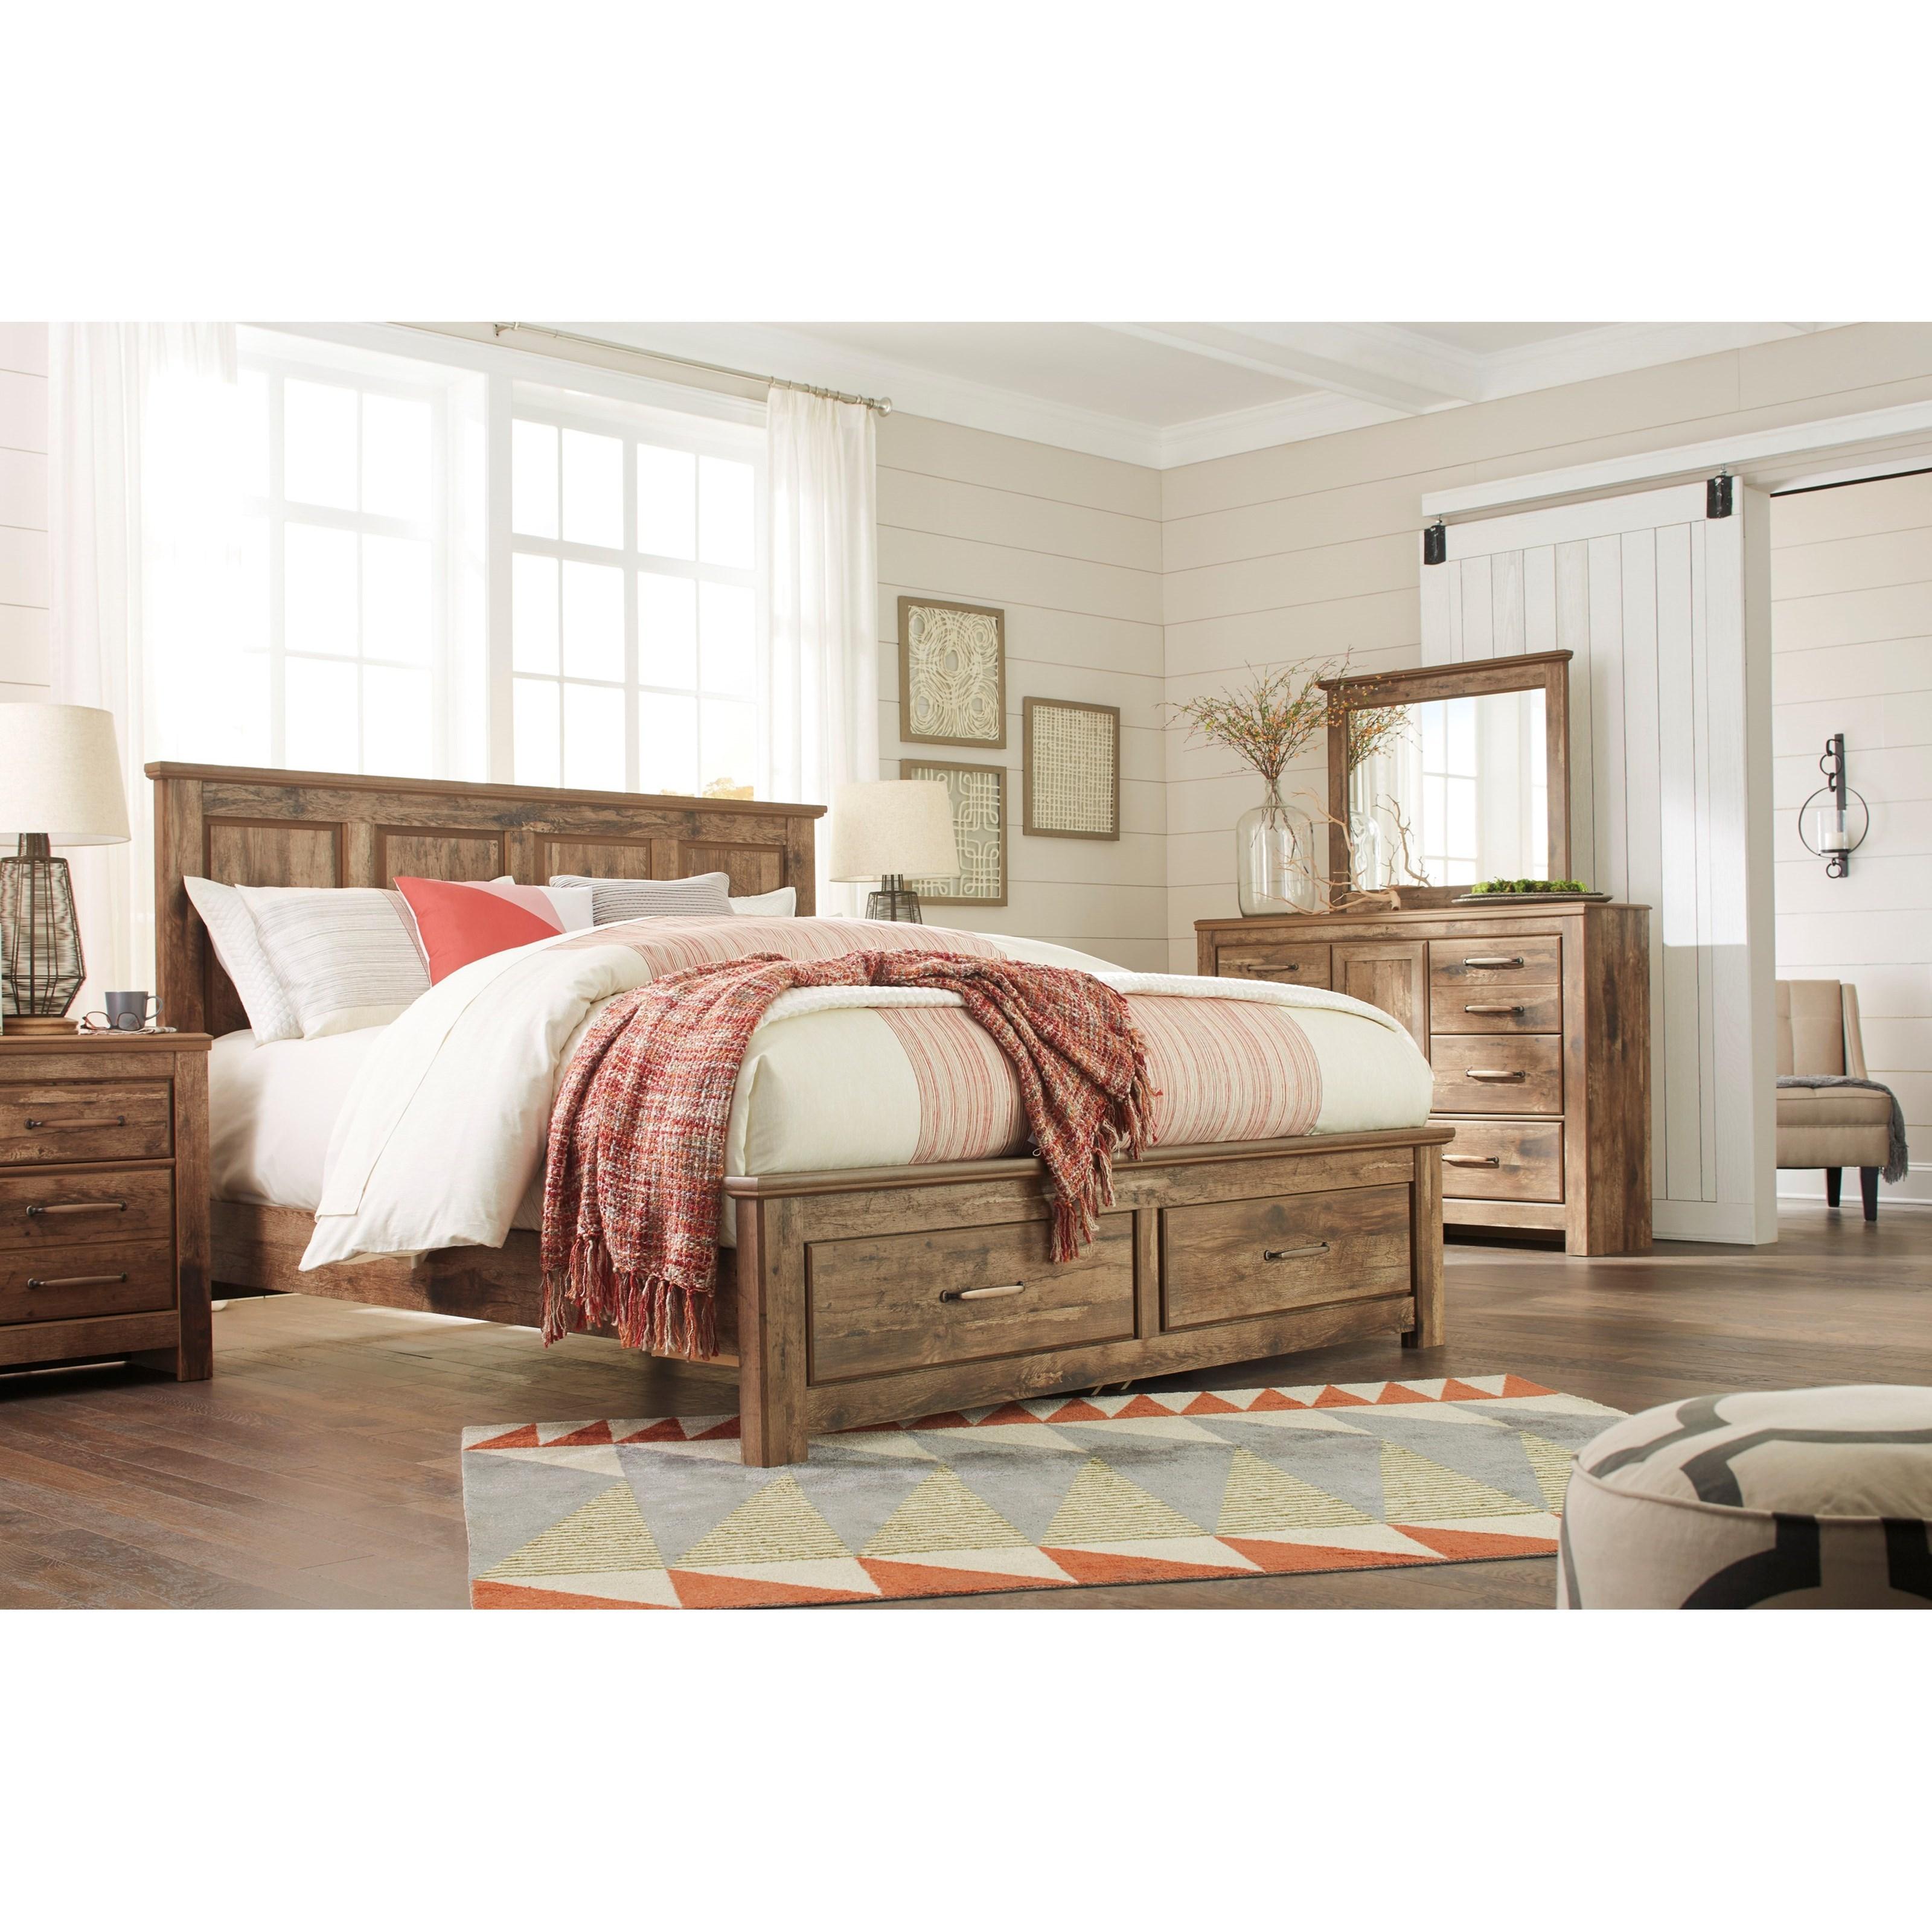 Ashley Signature Design Blaneville King Panel Storage Bed Dunk Bright Furniture Platform